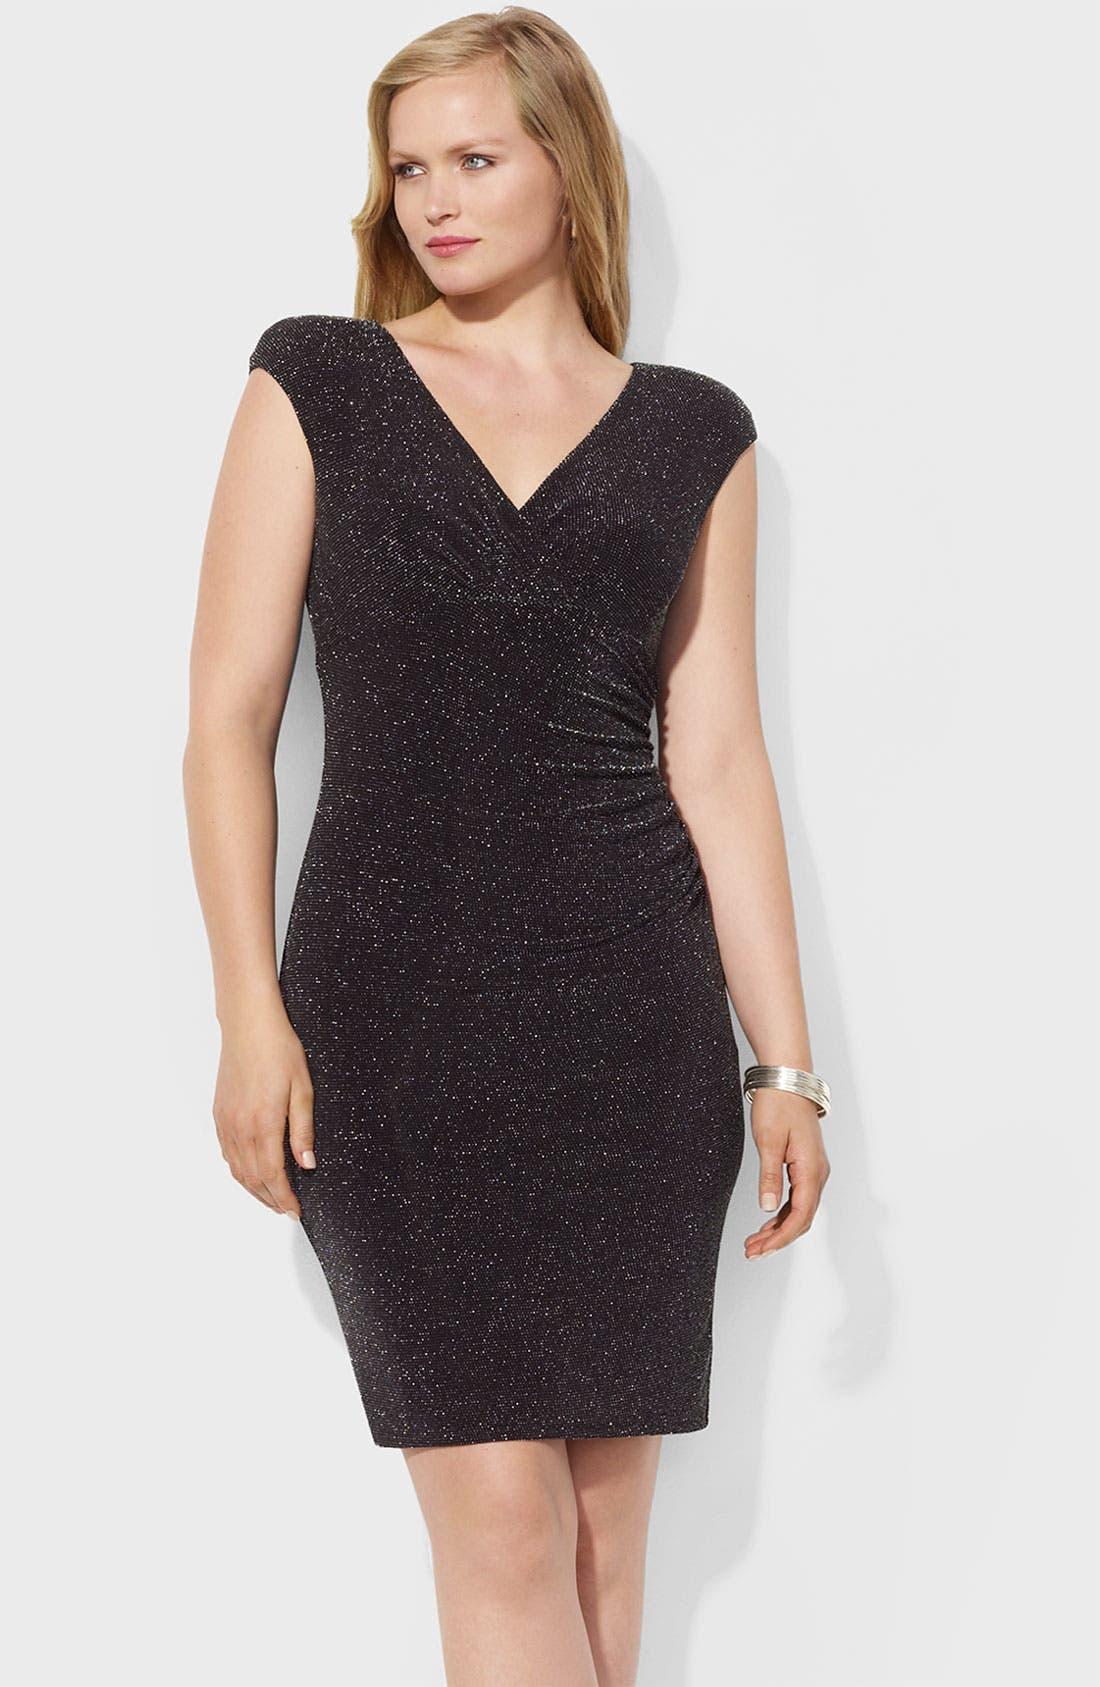 Main Image - Lauren Ralph Lauren 'Adara' Metallic Sheath Dress (Plus)